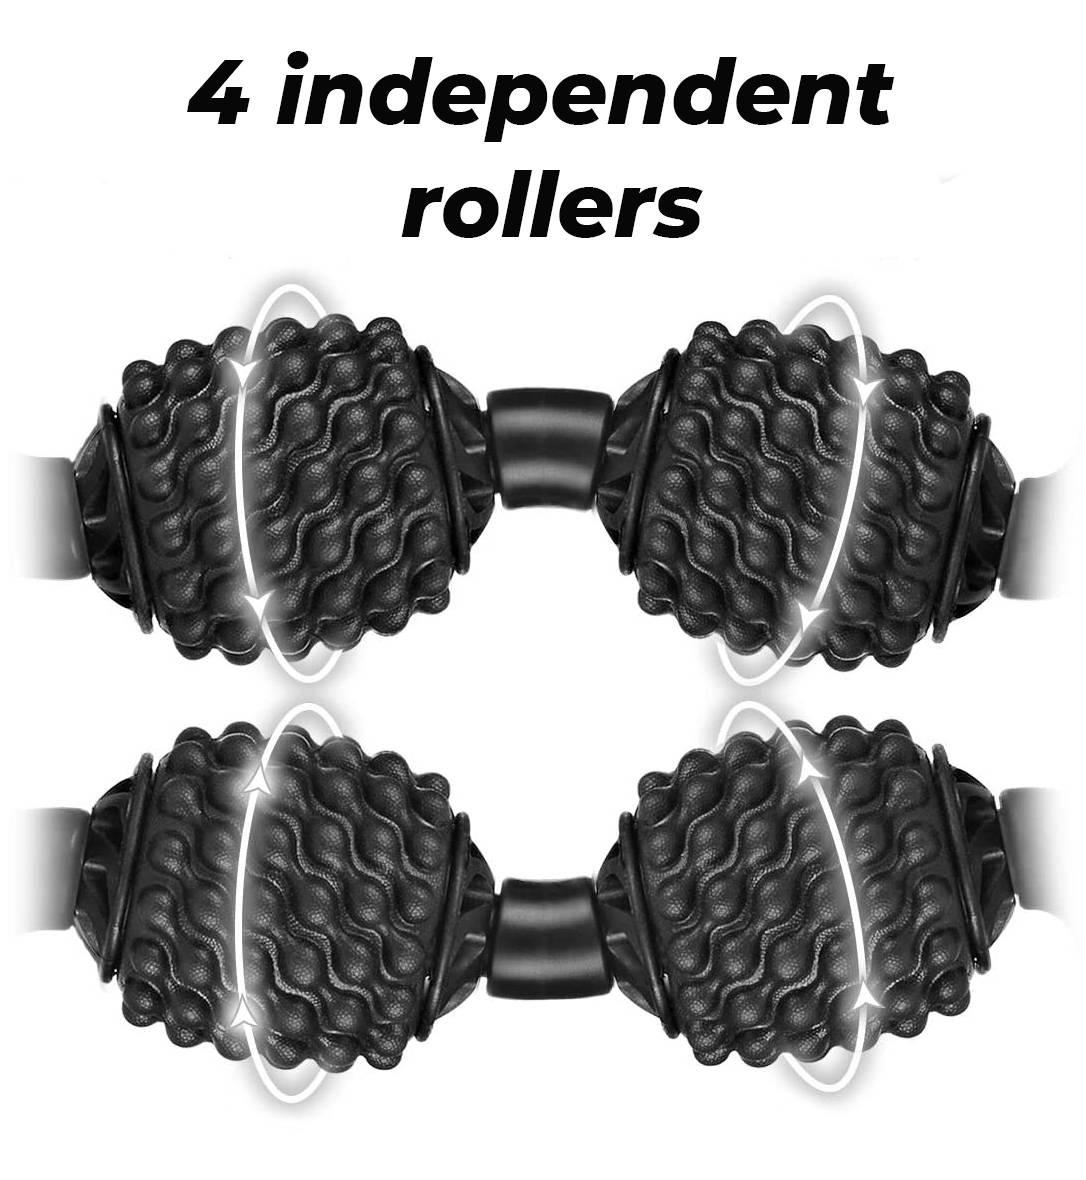 FitRoll Pro Cellulite Roller   Best massage roller for cellulite. Anti Cellulite Massager and Myofascial Massager for Cellulite